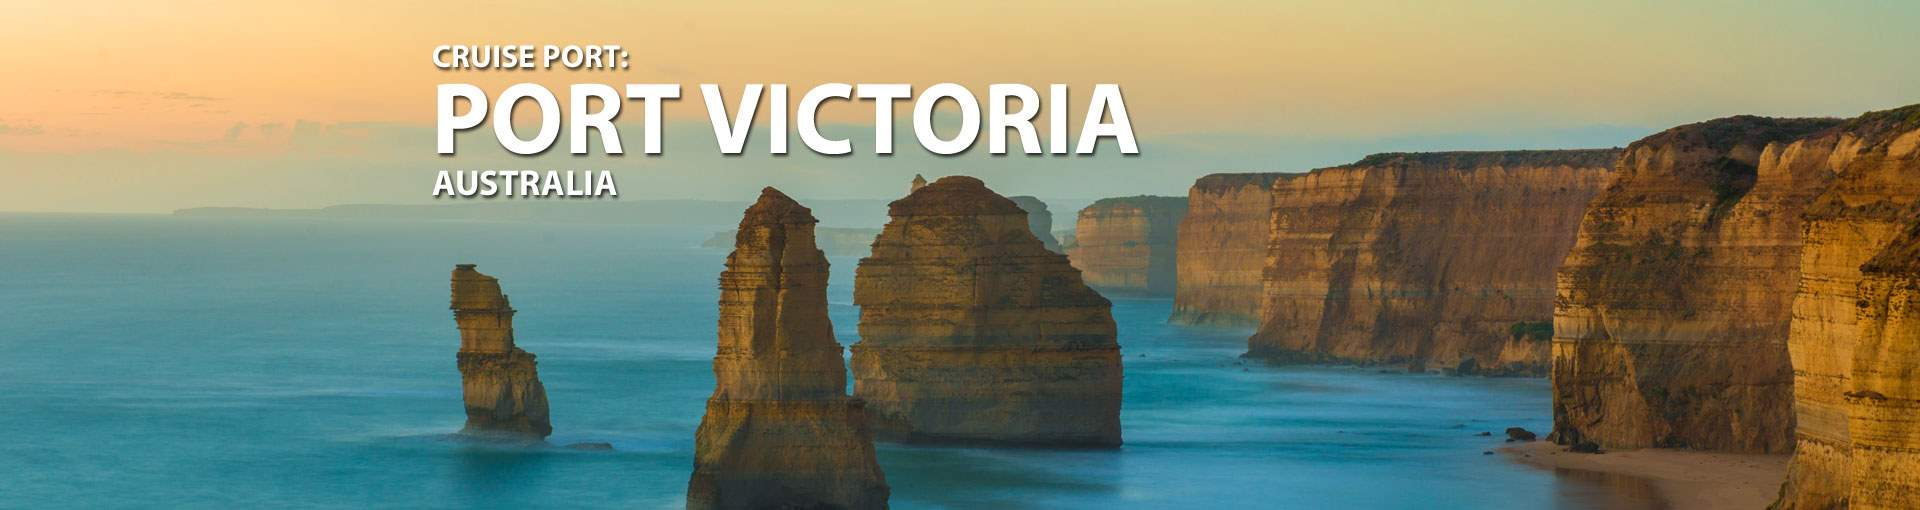 Cruises to Port Victoria, Australia